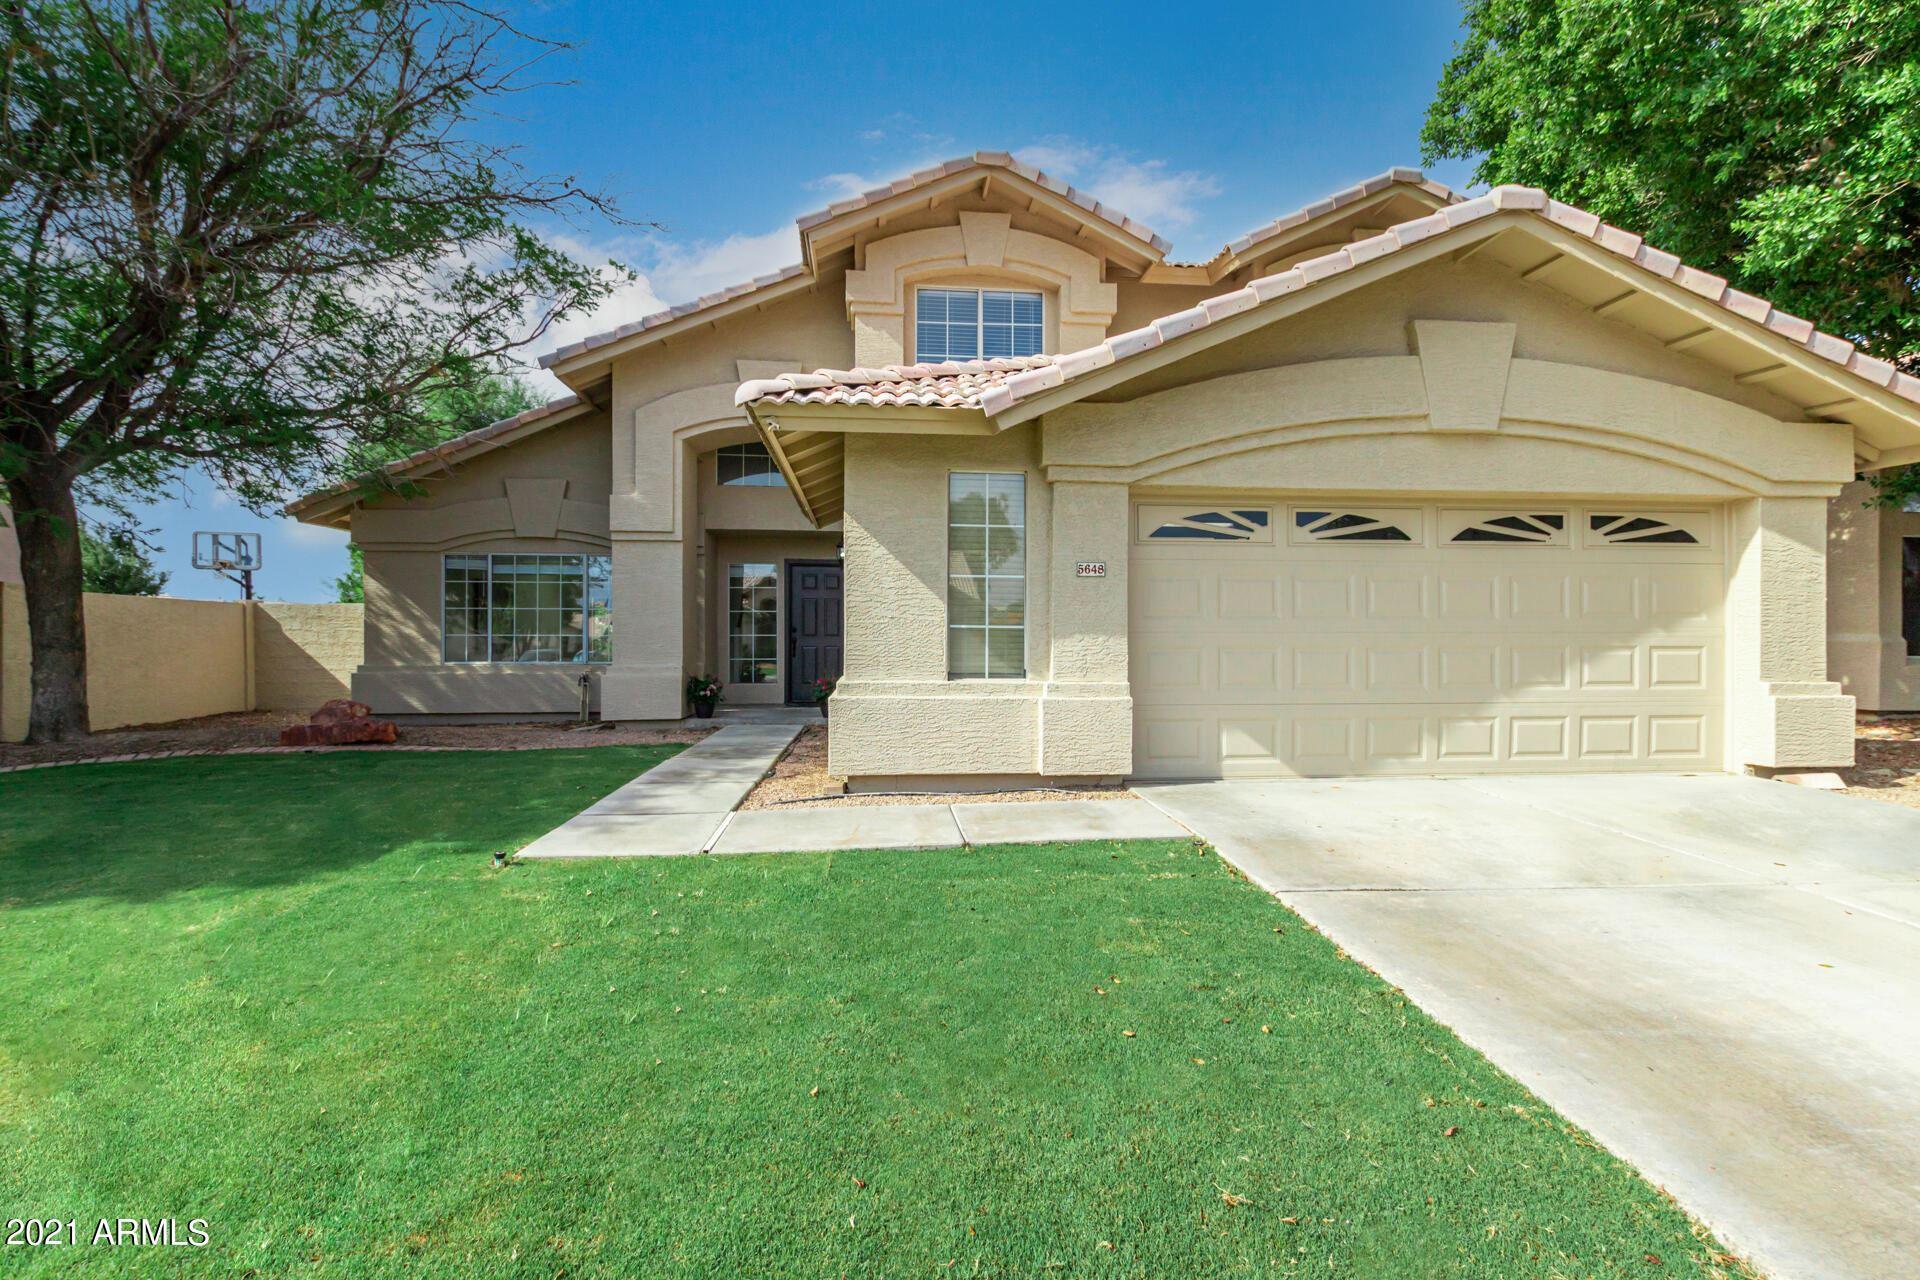 Photo of 5648 W Tonopah Drive, Glendale, AZ 85308 (MLS # 6269134)